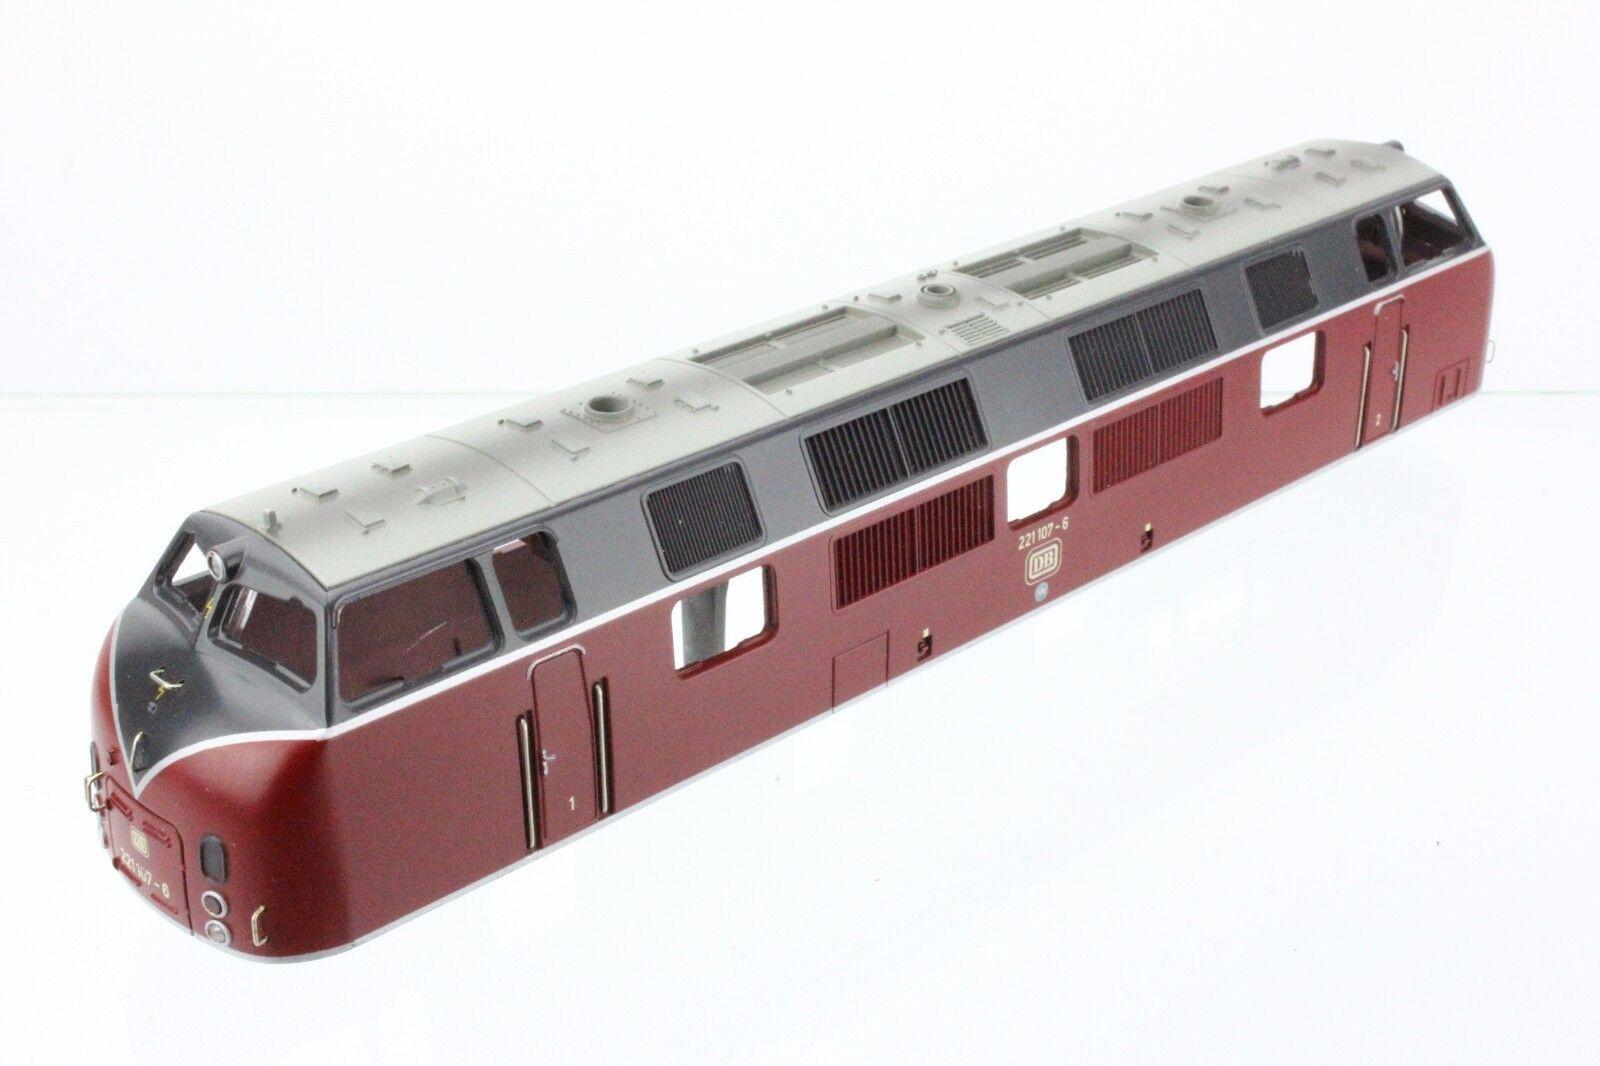 Märklin 326120 Gehäuse Lokaufbau für Diesellok 3582 3682 V200 BR 221 107-6